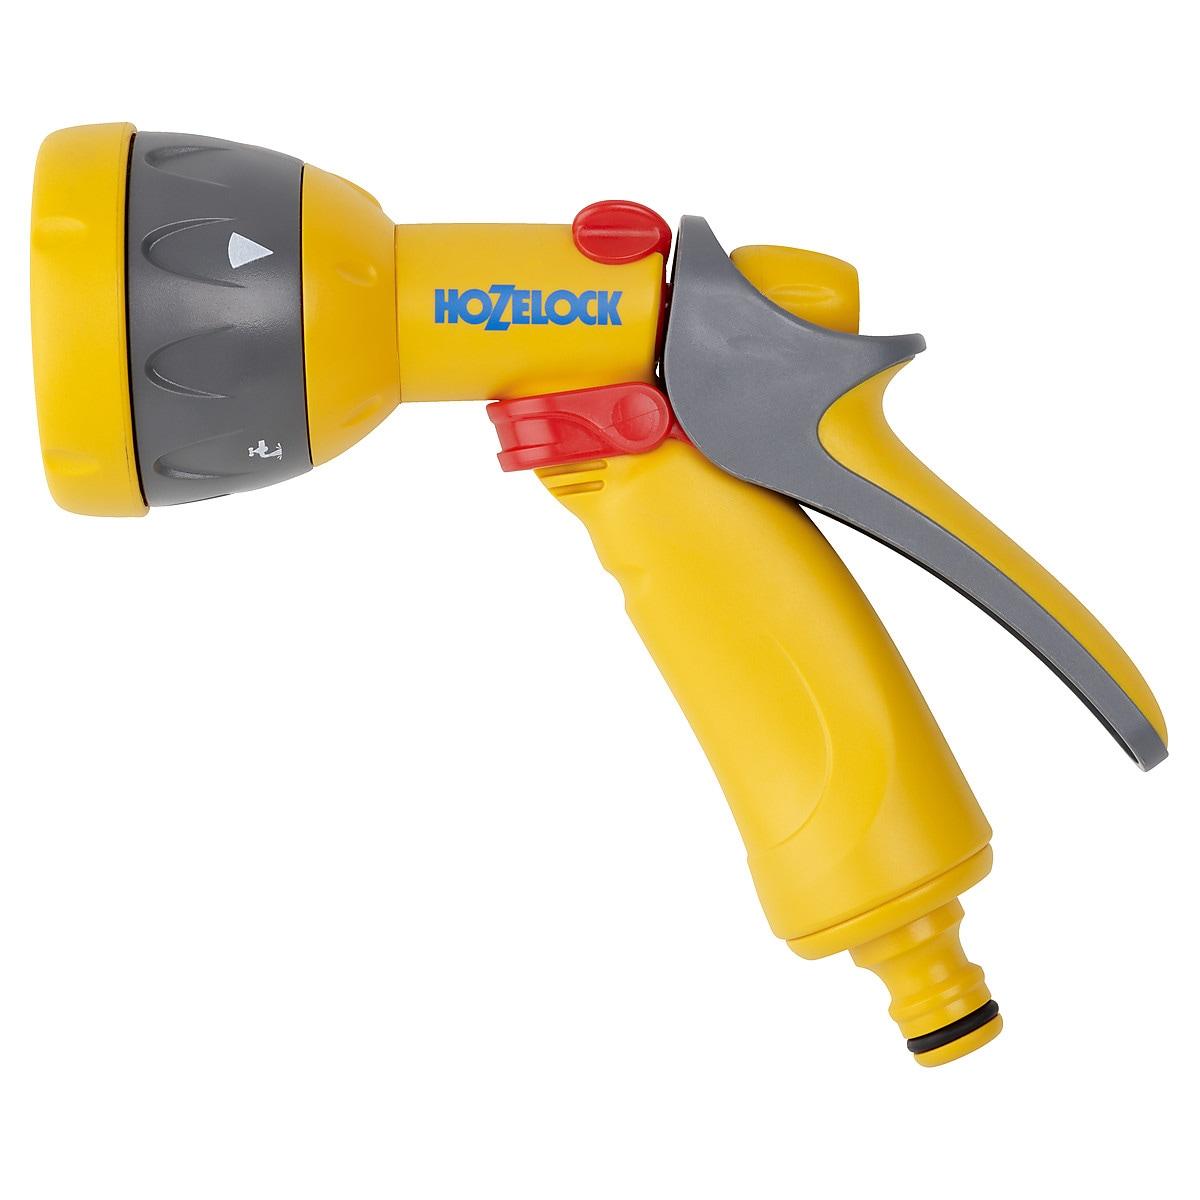 Hozelock Multi Spray sprøytepistol